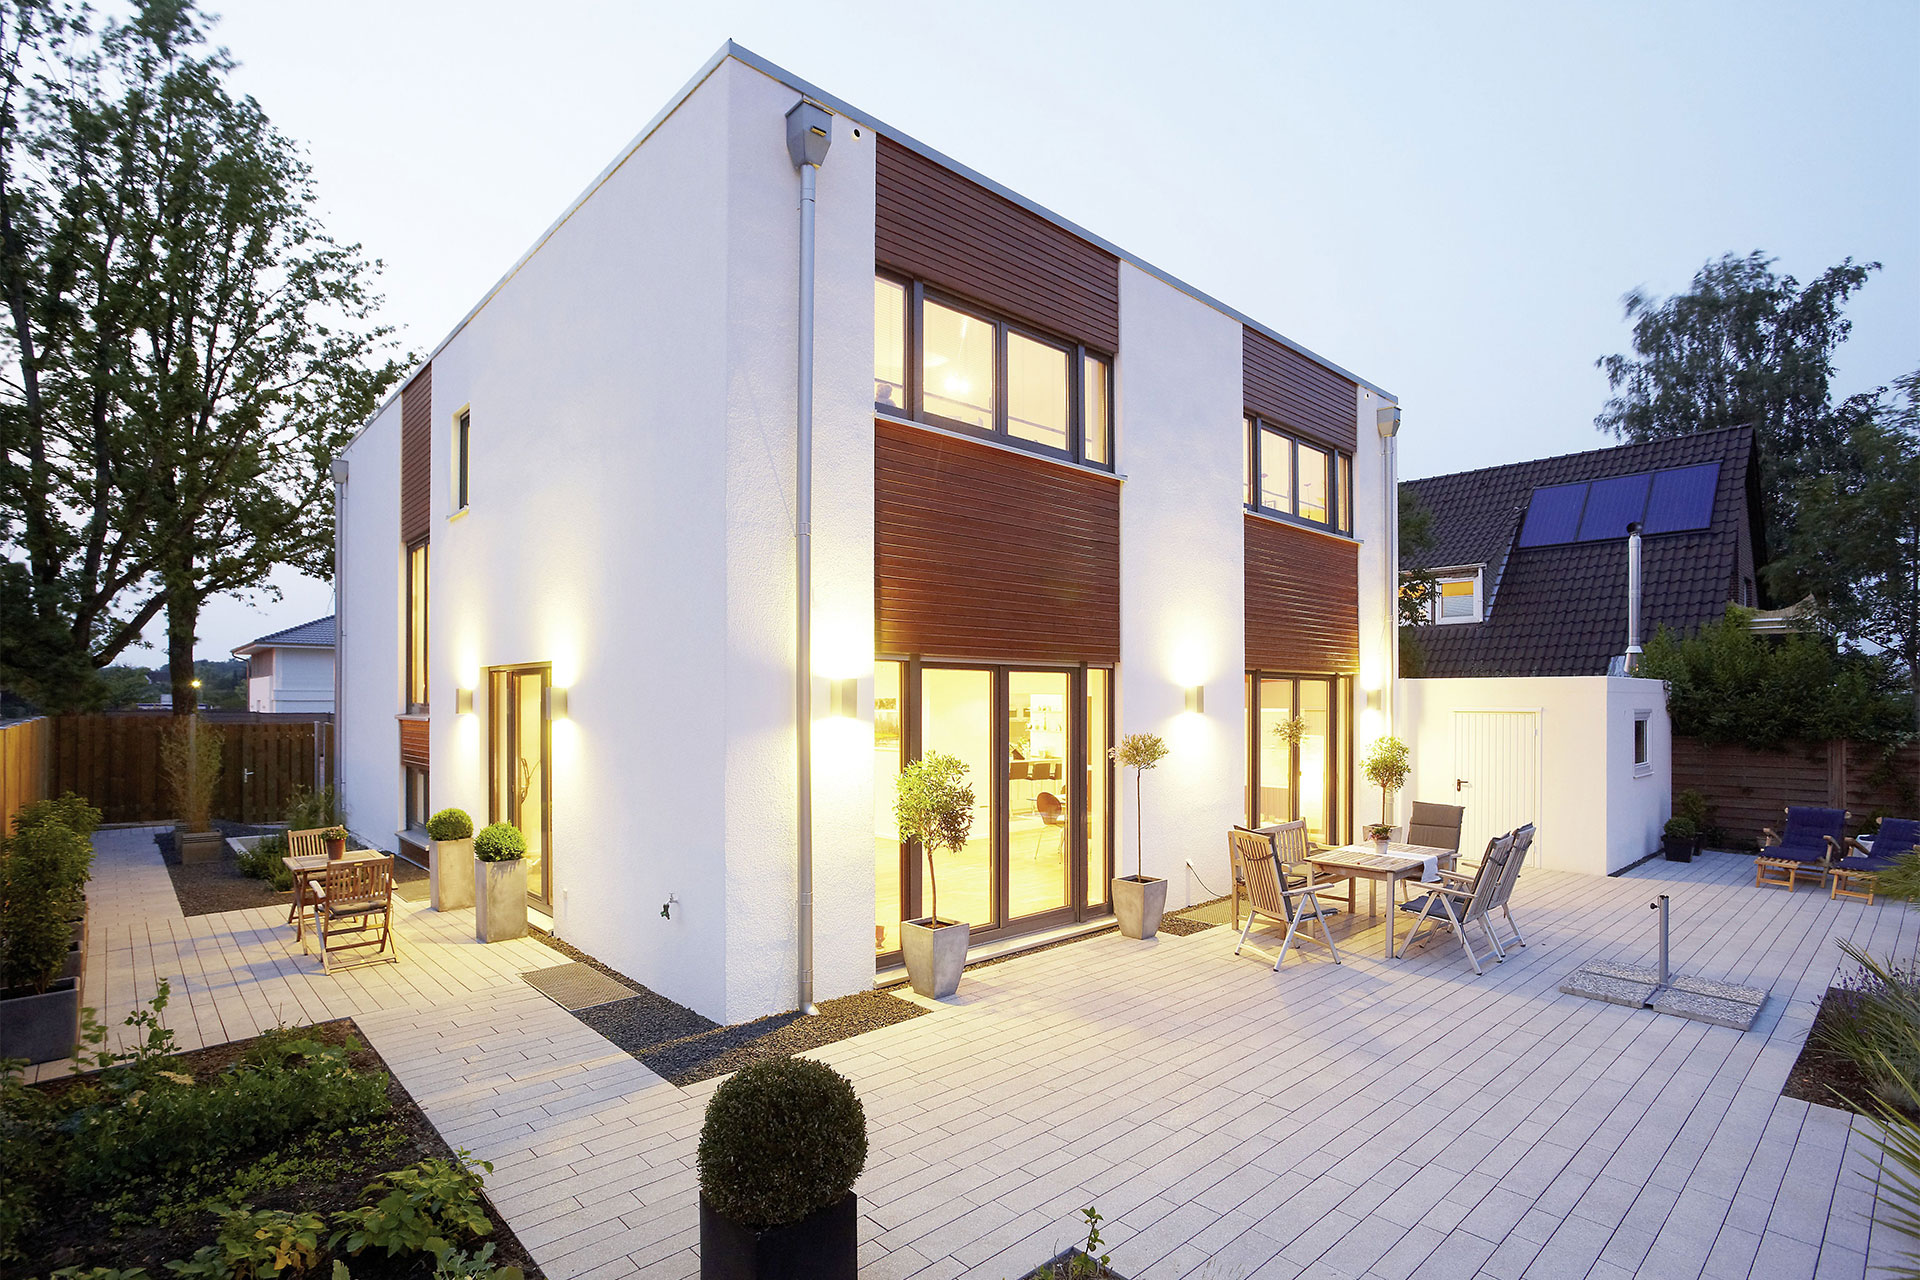 Gussek haus bauhaus stil for Architektur 20er